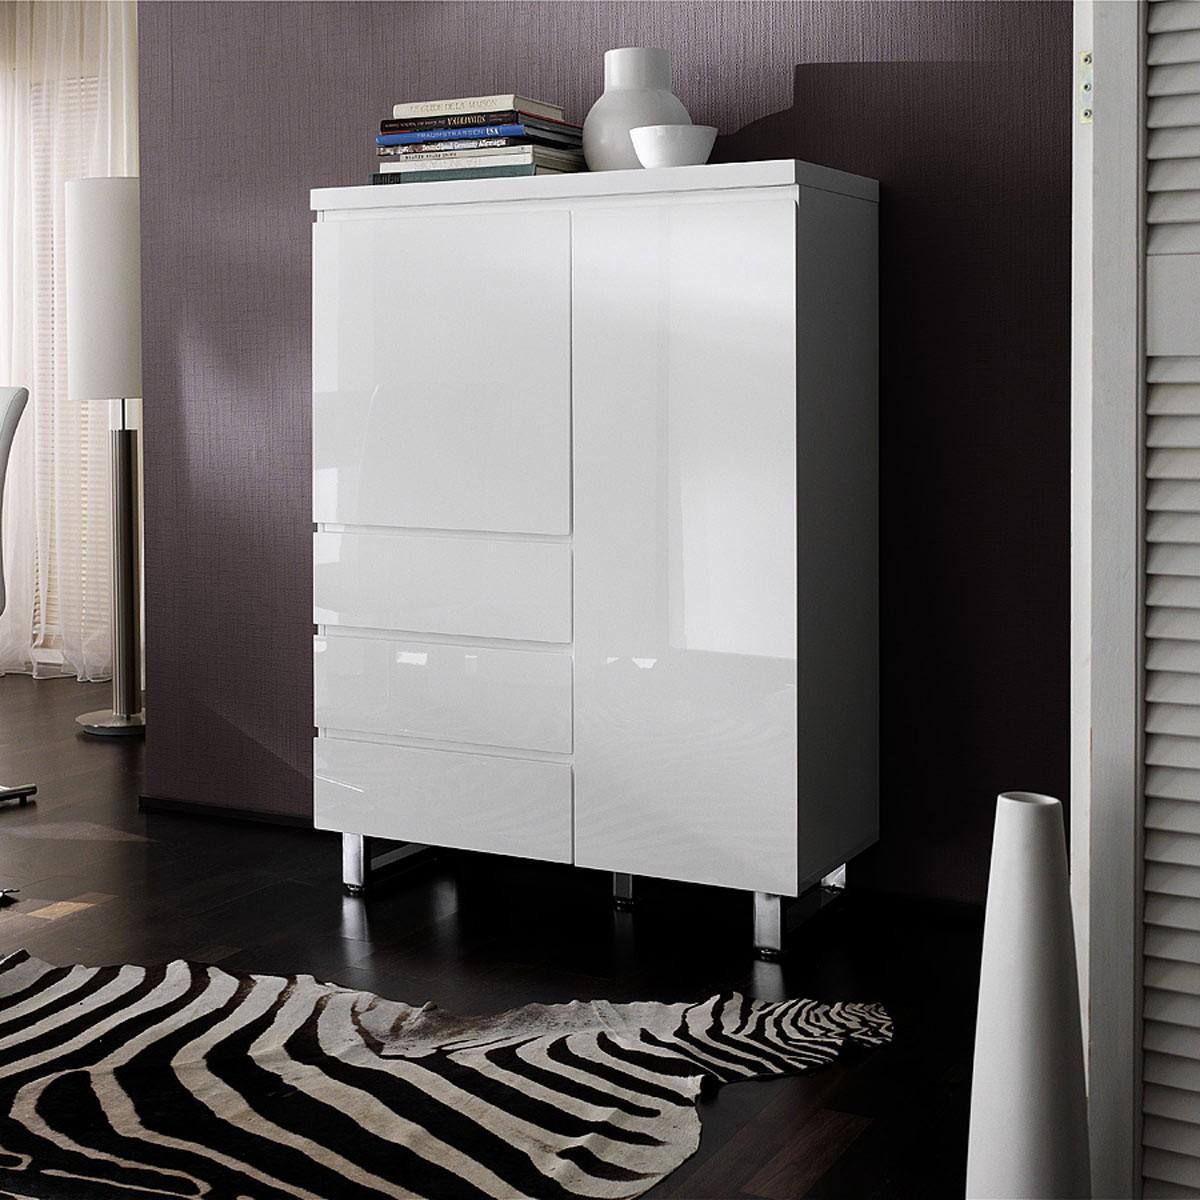 Ikea Kommode Weiss Lack 2021